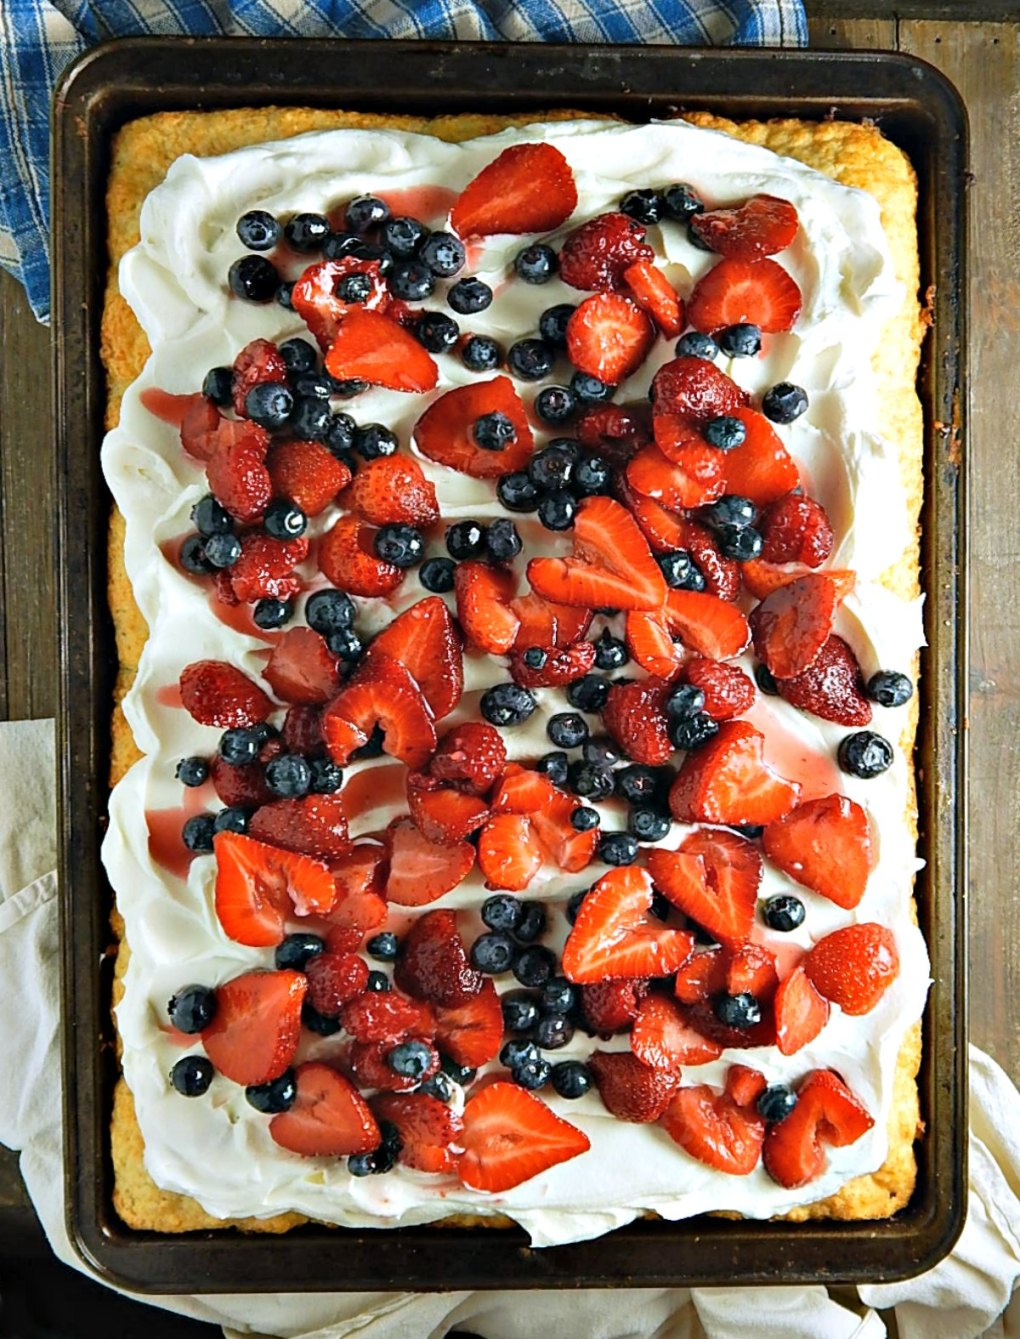 Sheetpan Strawberry Shortcake